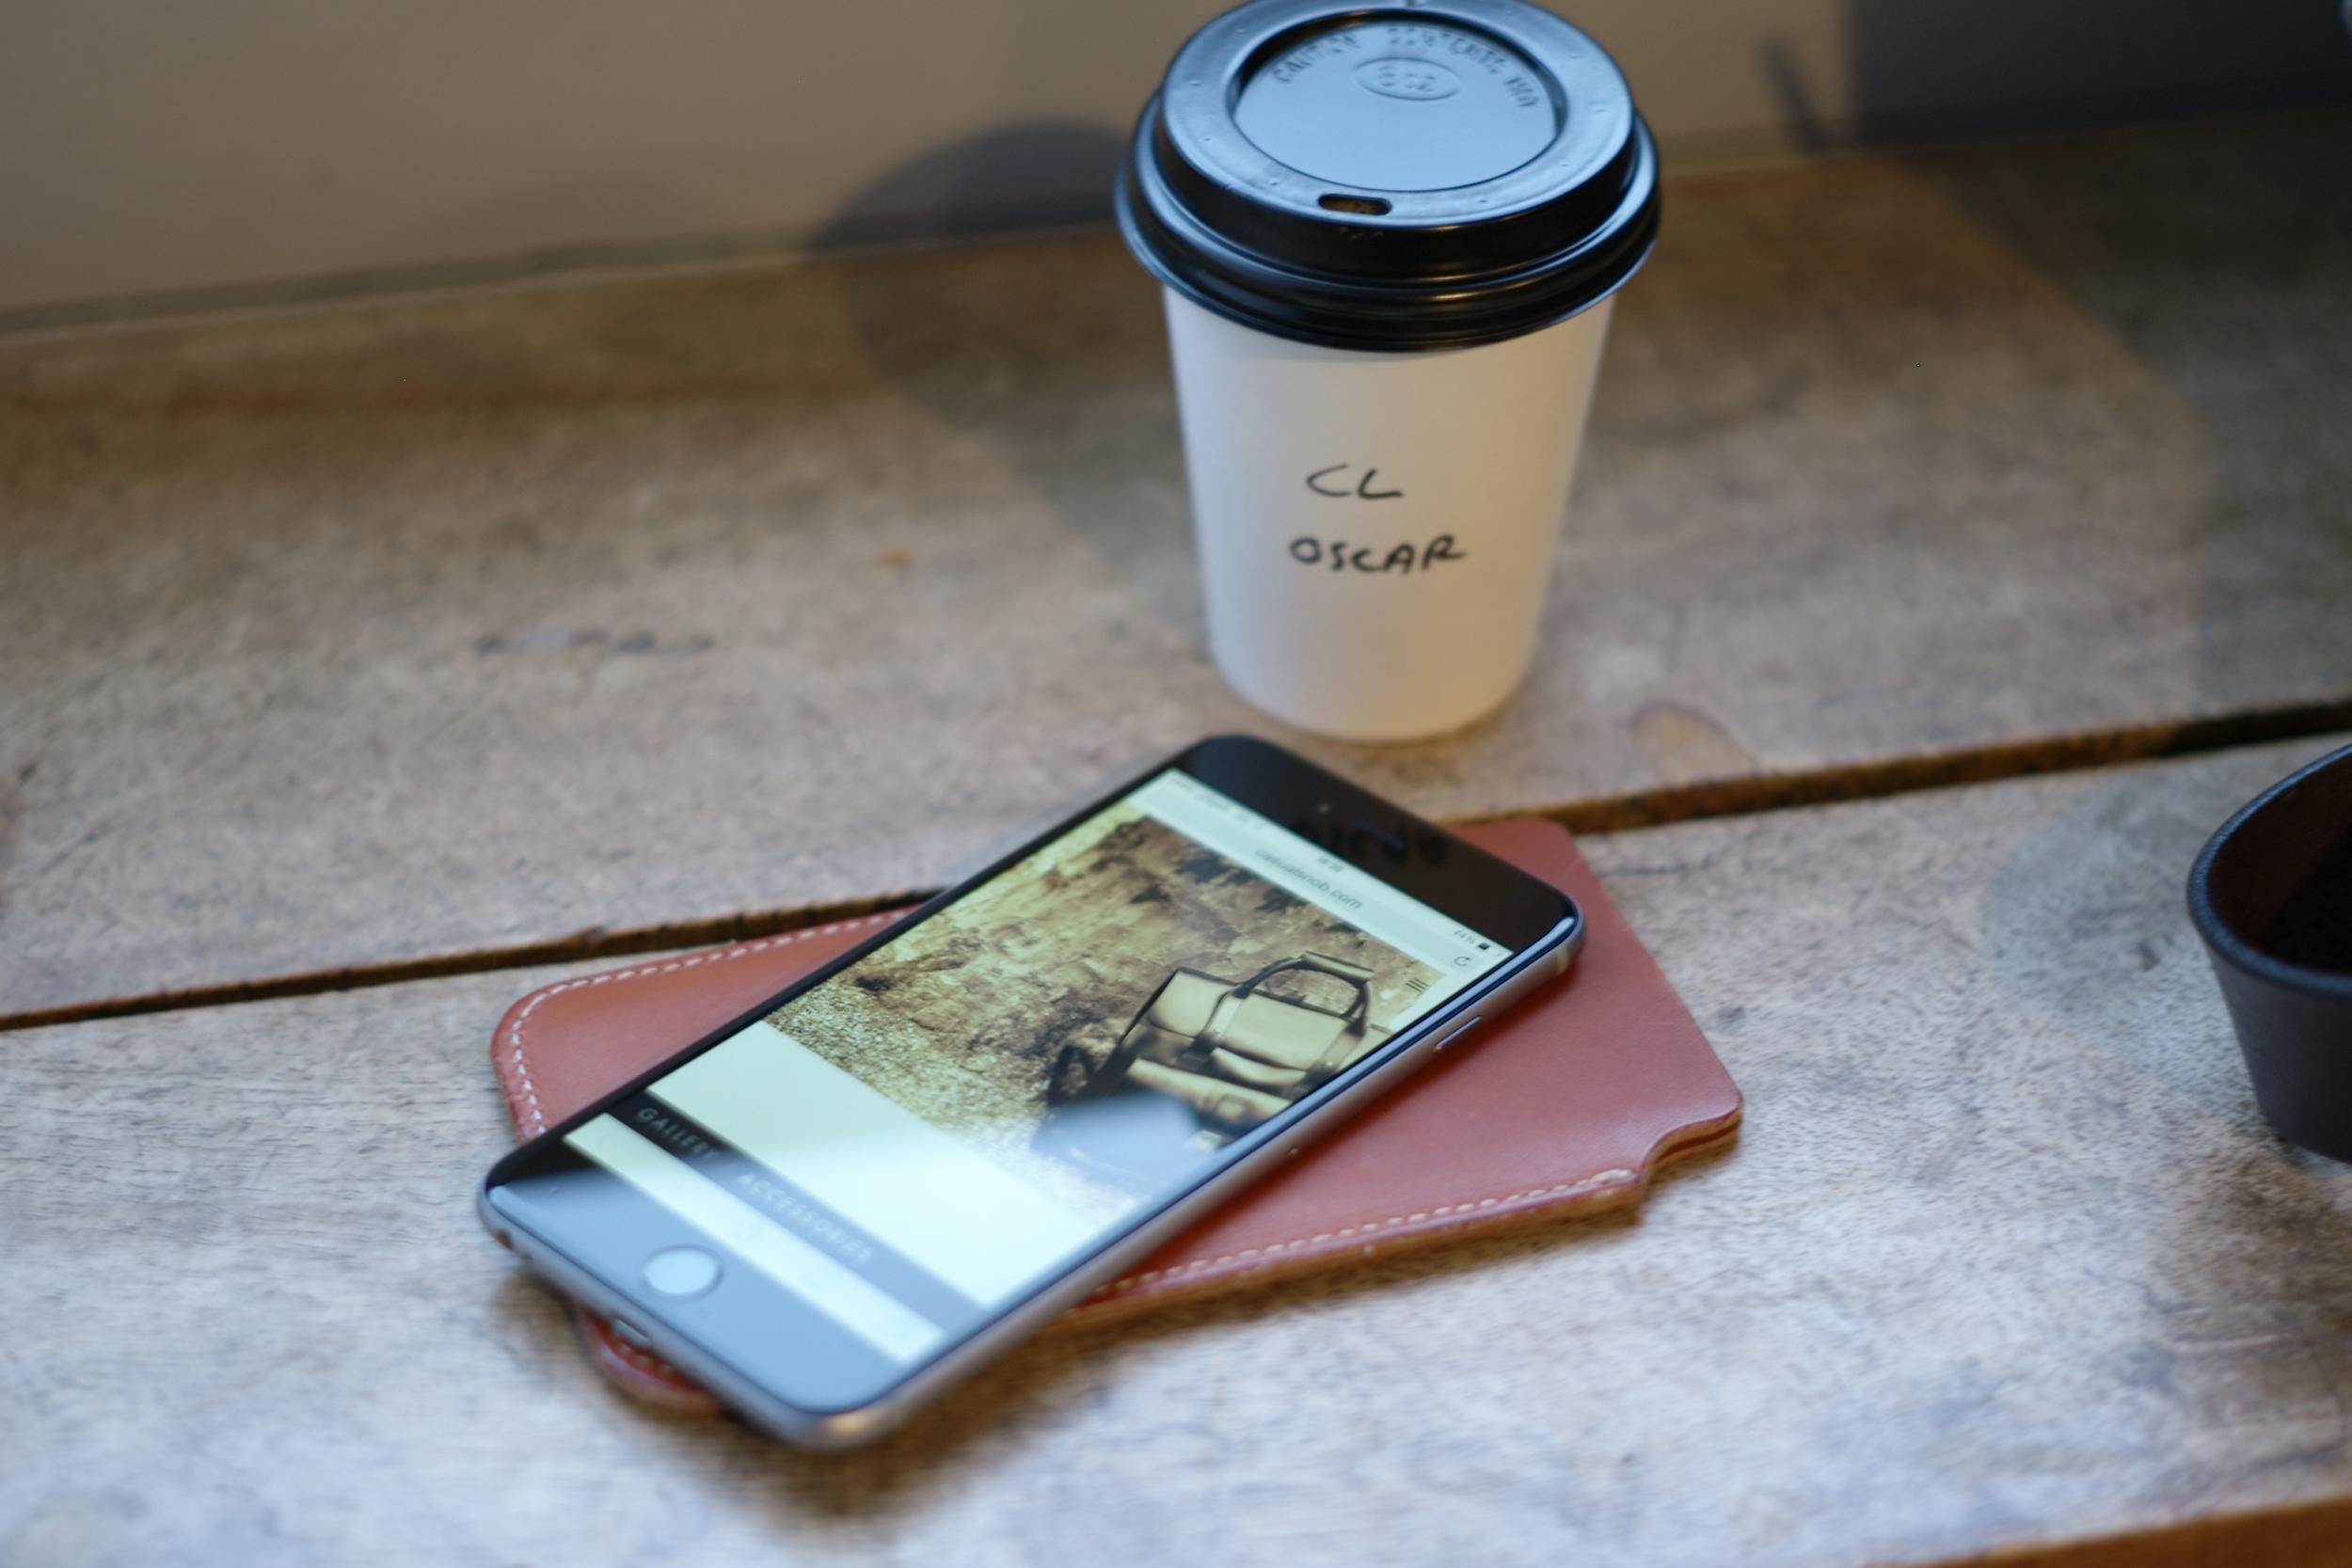 Casual Snob Iphone 6 Case By Ryan LondonA